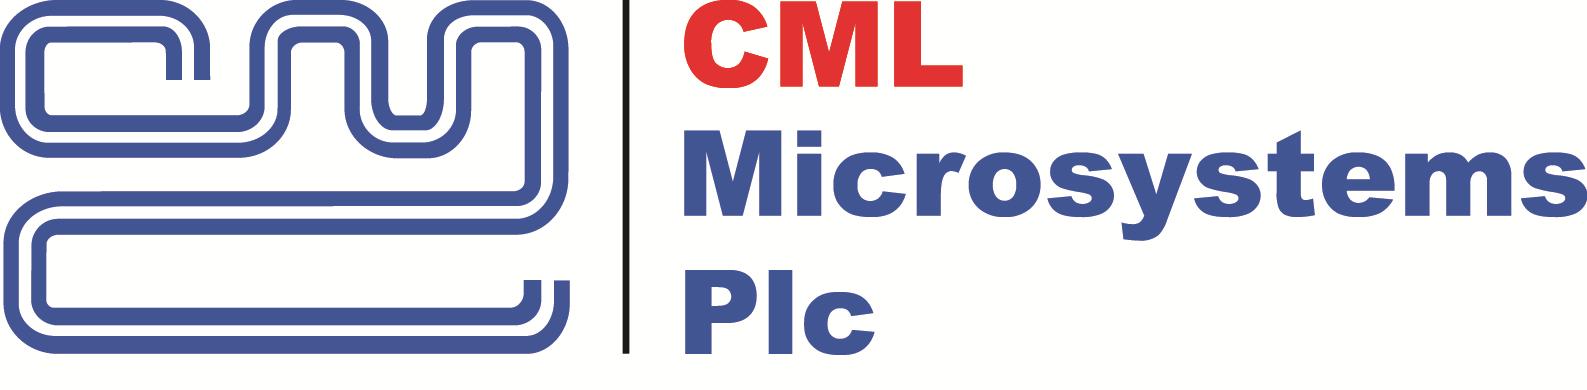 CML MICROSYSTEMS PLC Logo